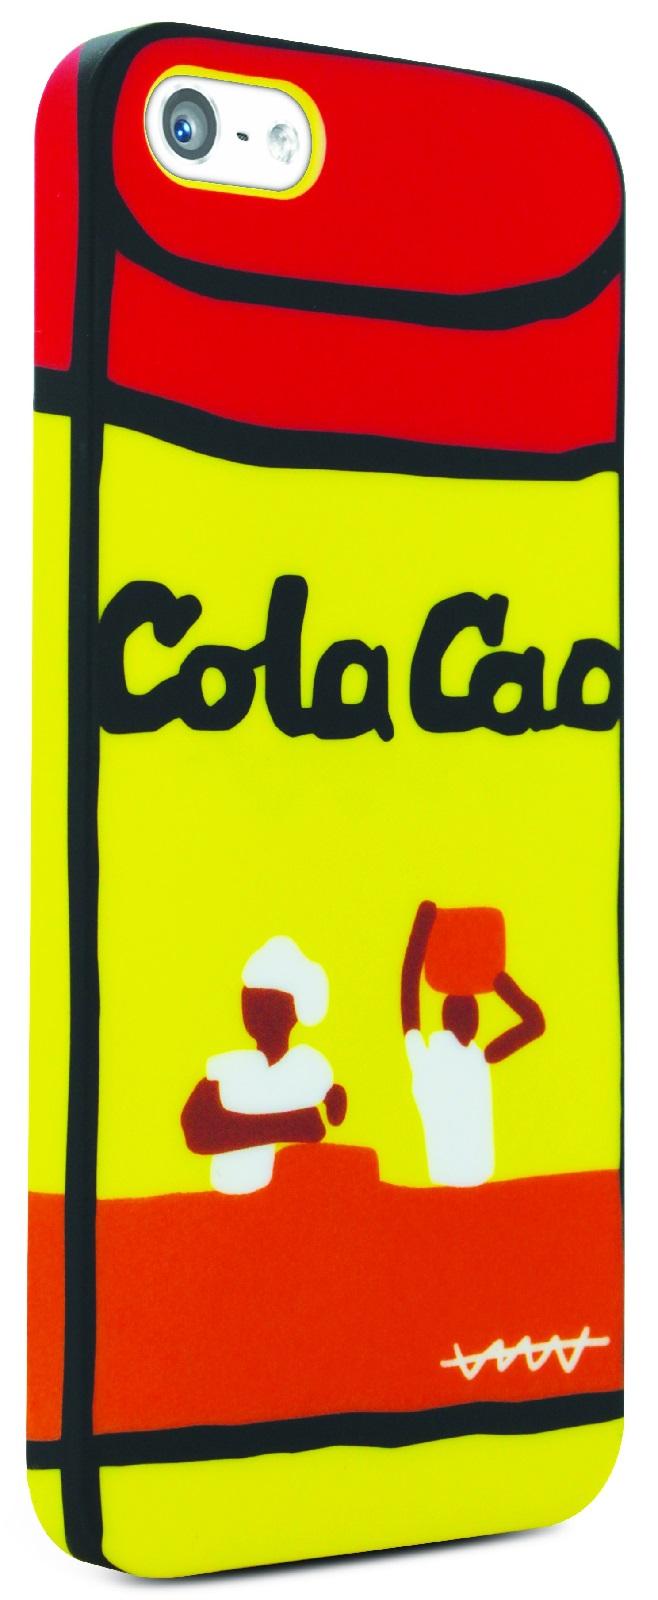 Callate la Boca Cola Cao (CBCT005) - чехол для iPhone 5/5S/SE